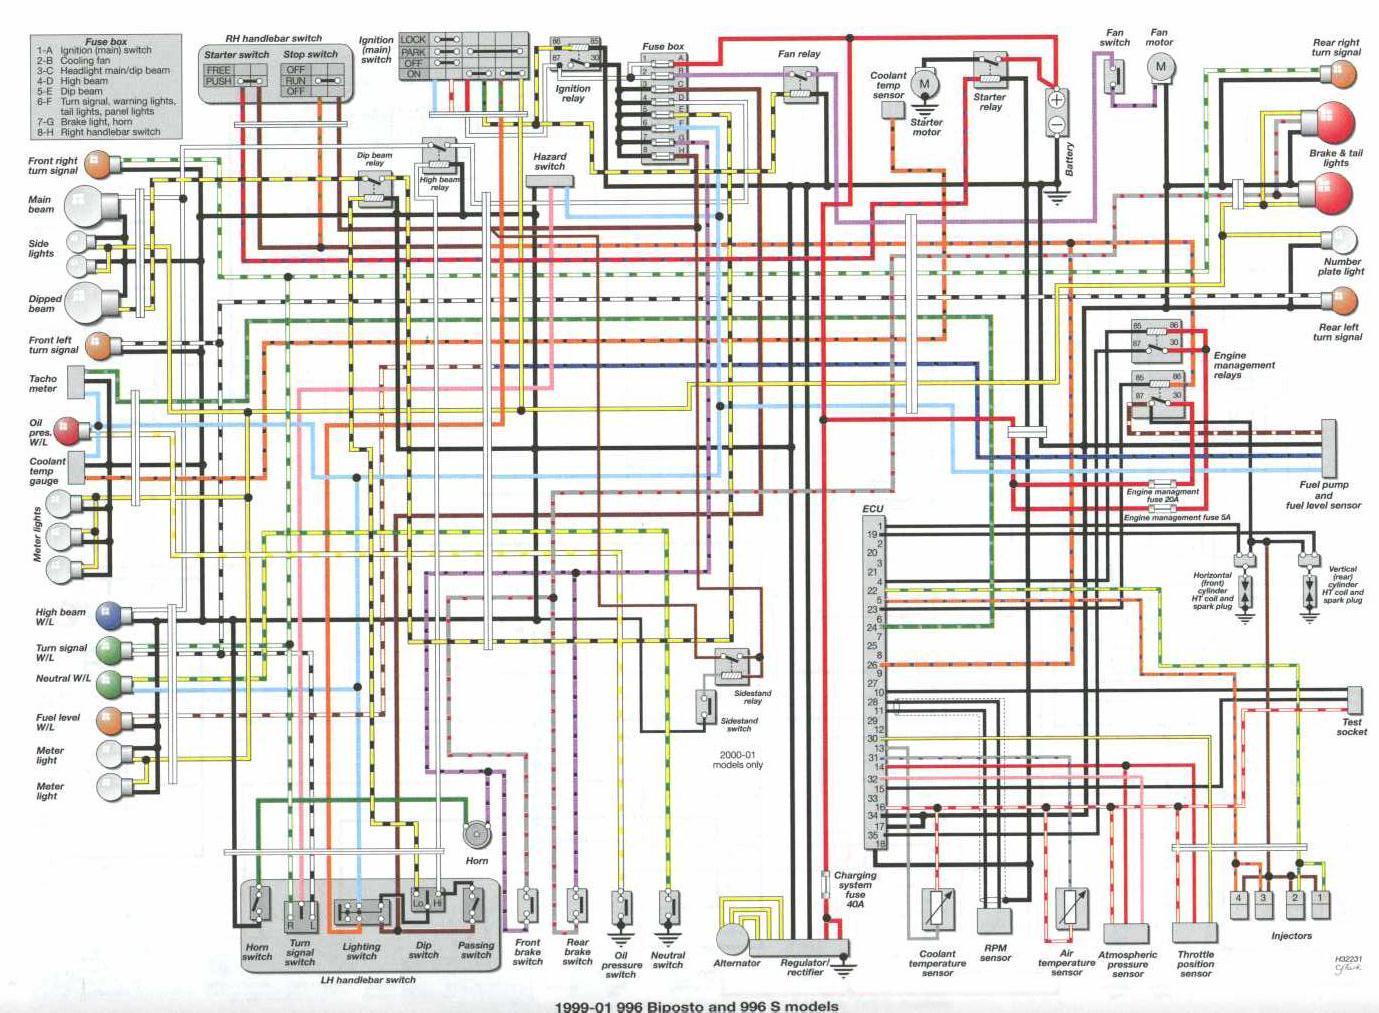 1986 fj1200 wiring diagram chimpanzee skull identification for 748 ducati ms the ultimate